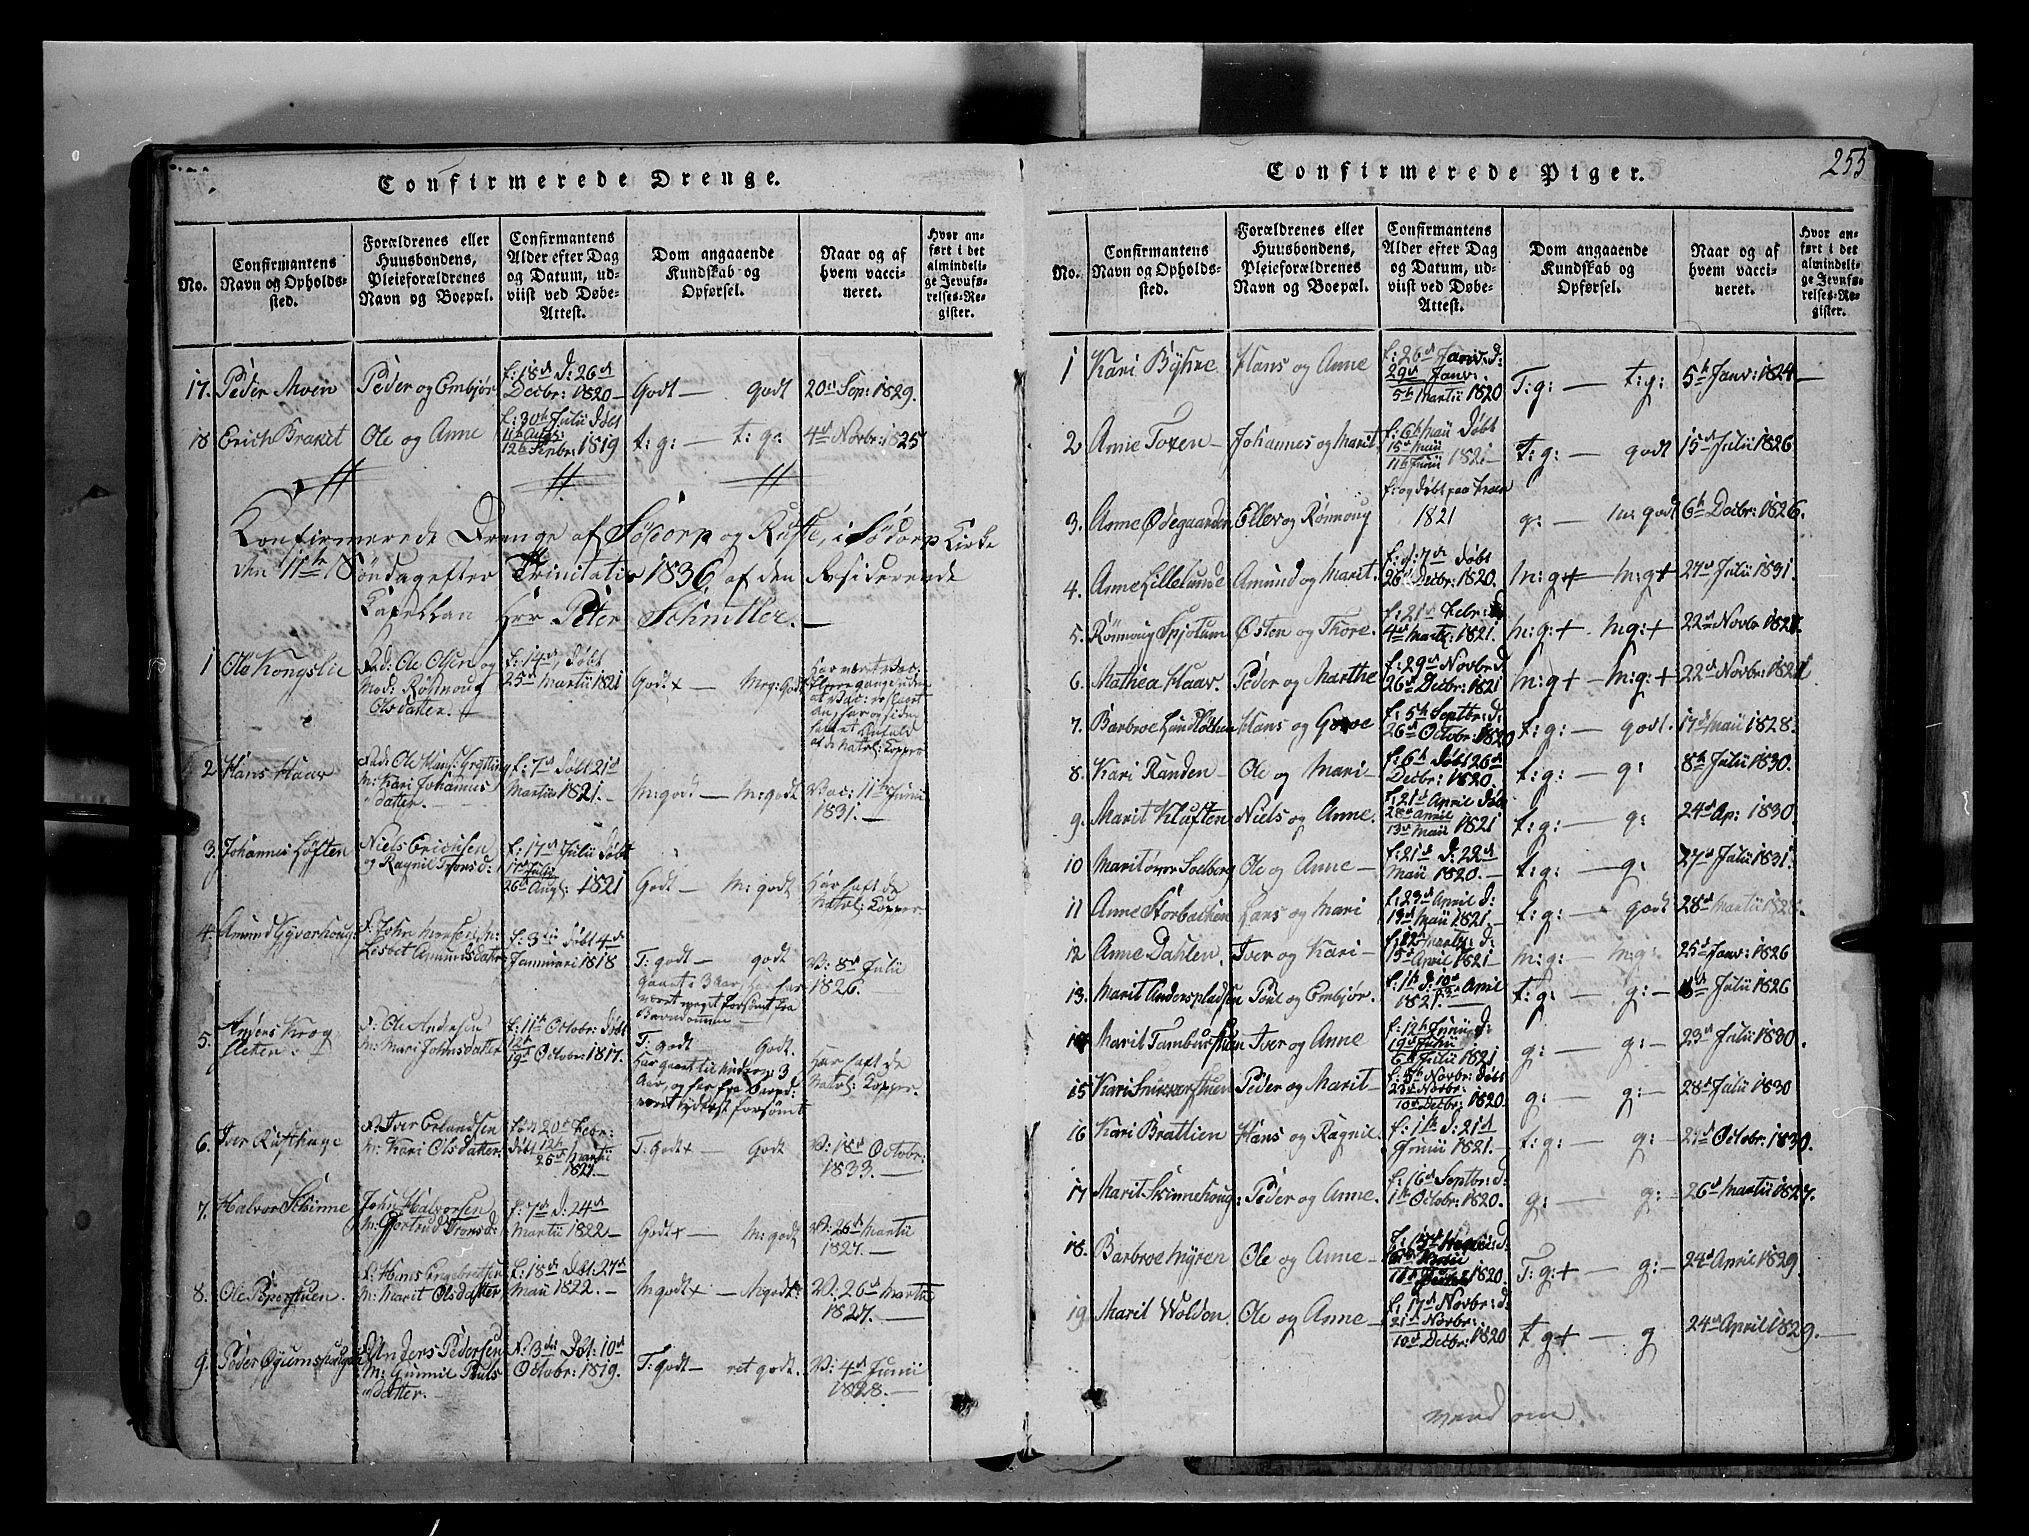 SAH, Fron prestekontor, H/Ha/Hab/L0004: Klokkerbok nr. 4, 1816-1850, s. 255